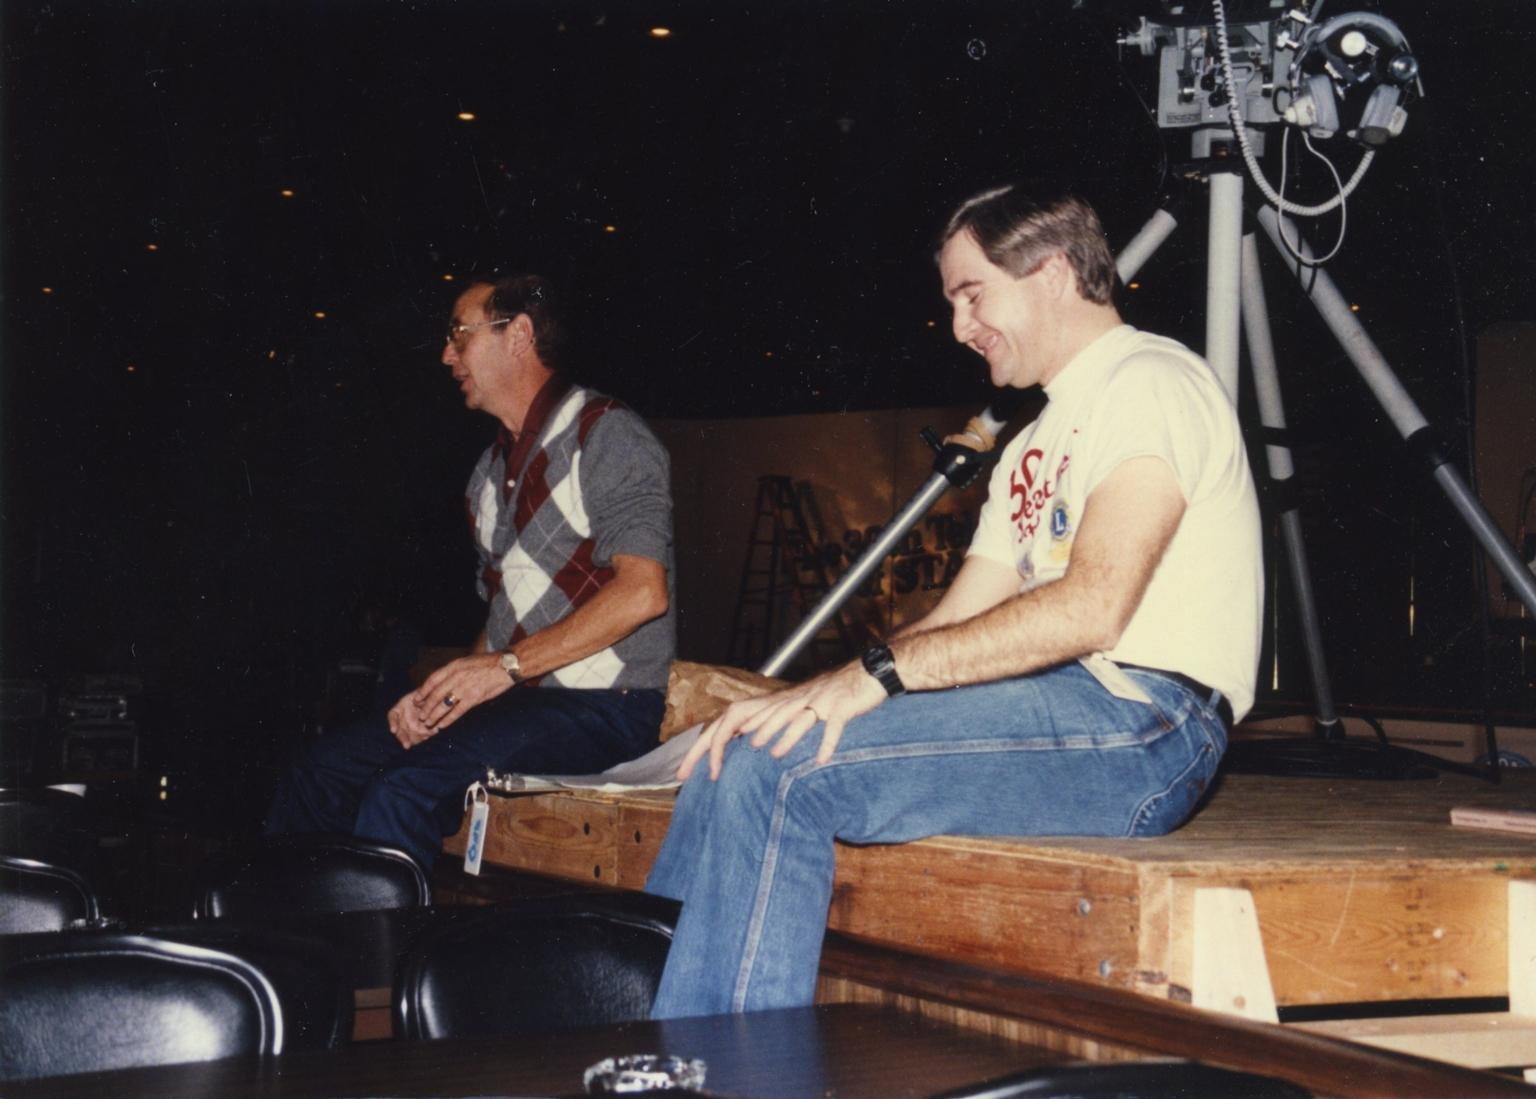 Bob Swisher and Kurt David Englehardt at Telethon of Stars in Paducah (KY)